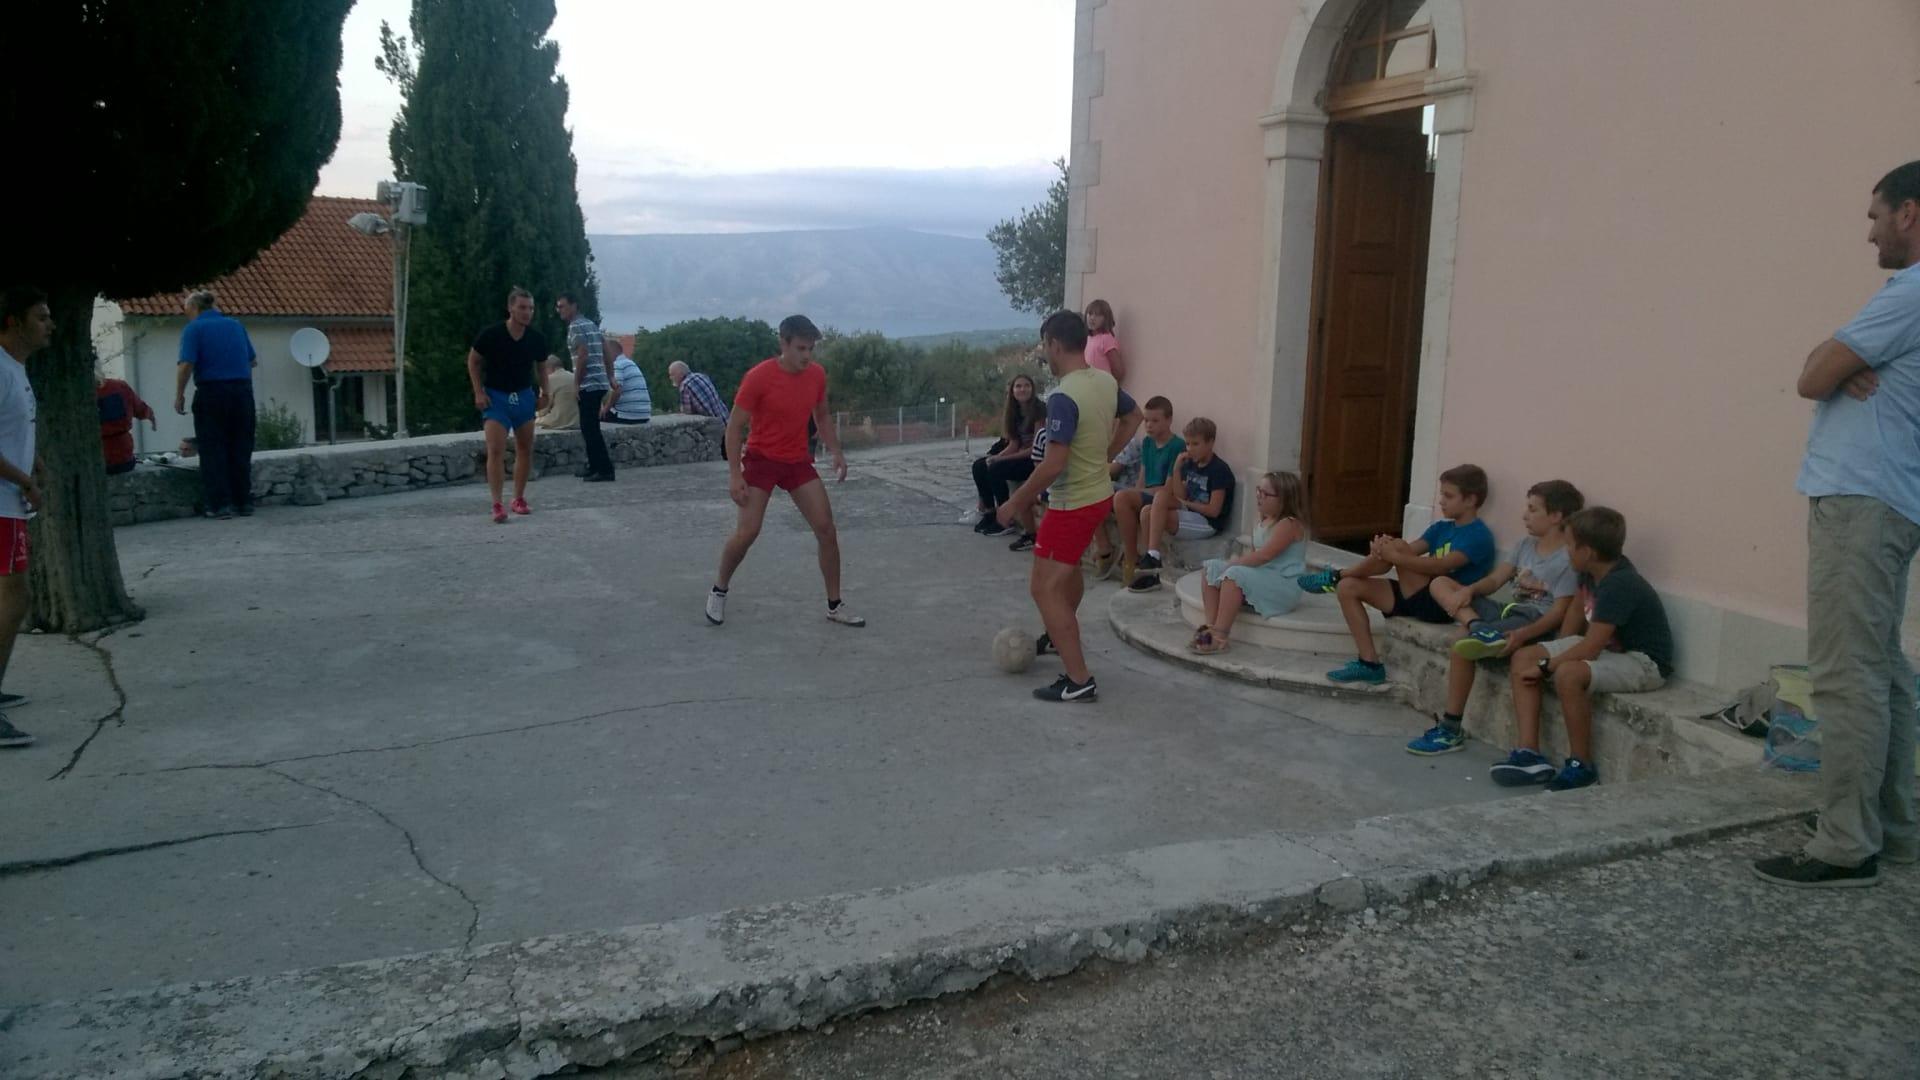 Die Jugend spielt Fußball vor dem Hof (Foto: Tonči Petrić/Stimme Kroatiens)